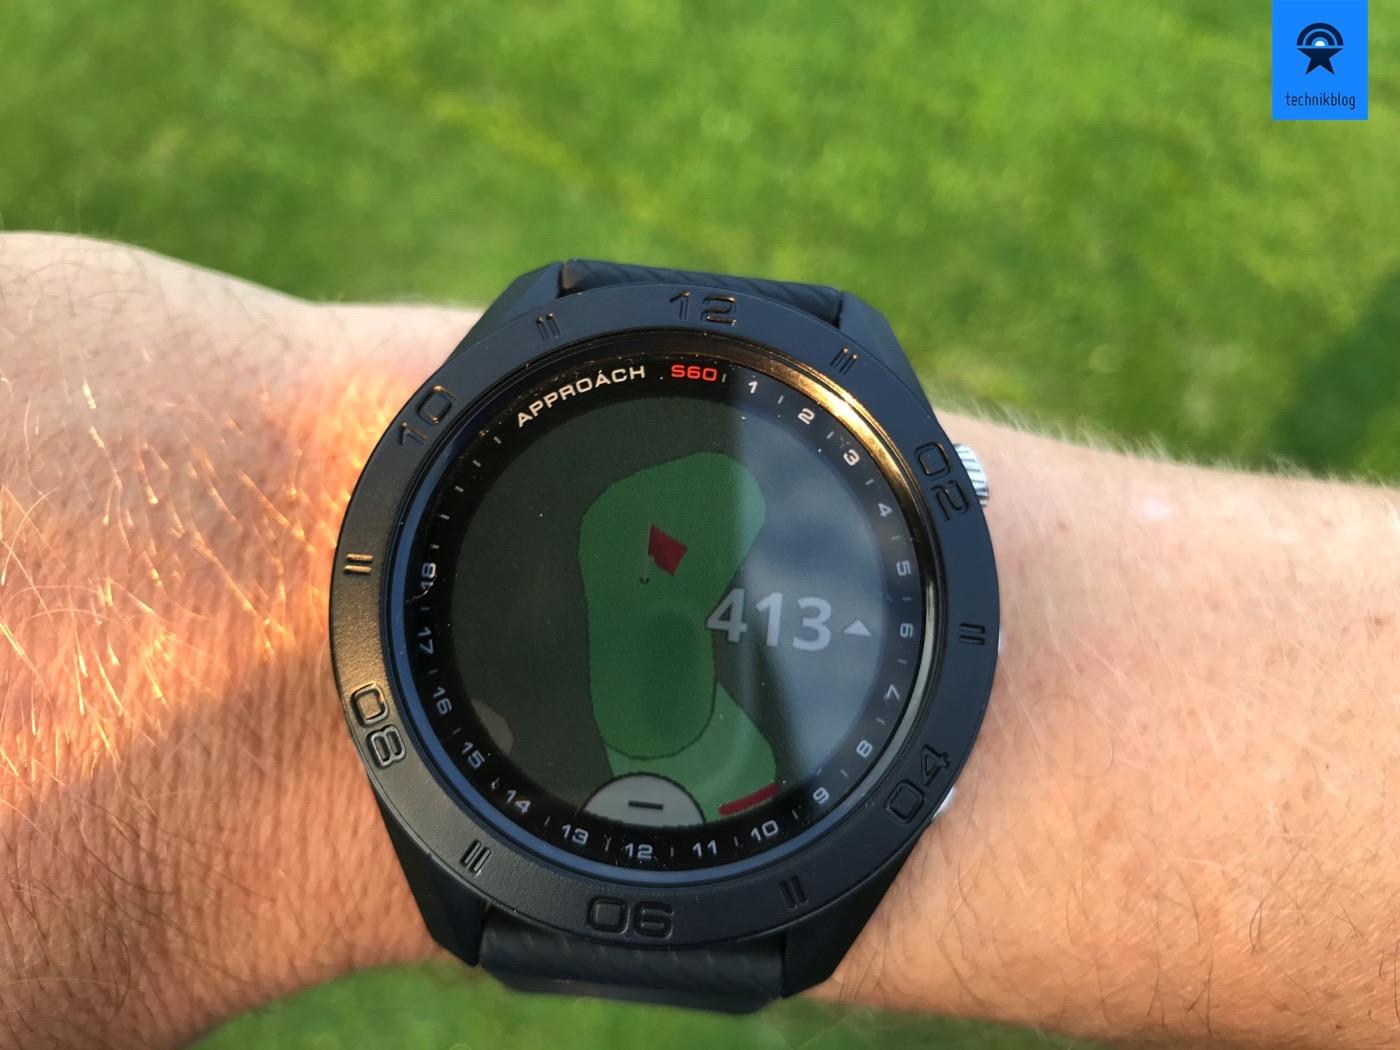 Golf Entfernungsmesser Iphone App : Testbericht garmin approach s u hast du noch sex oder spielst